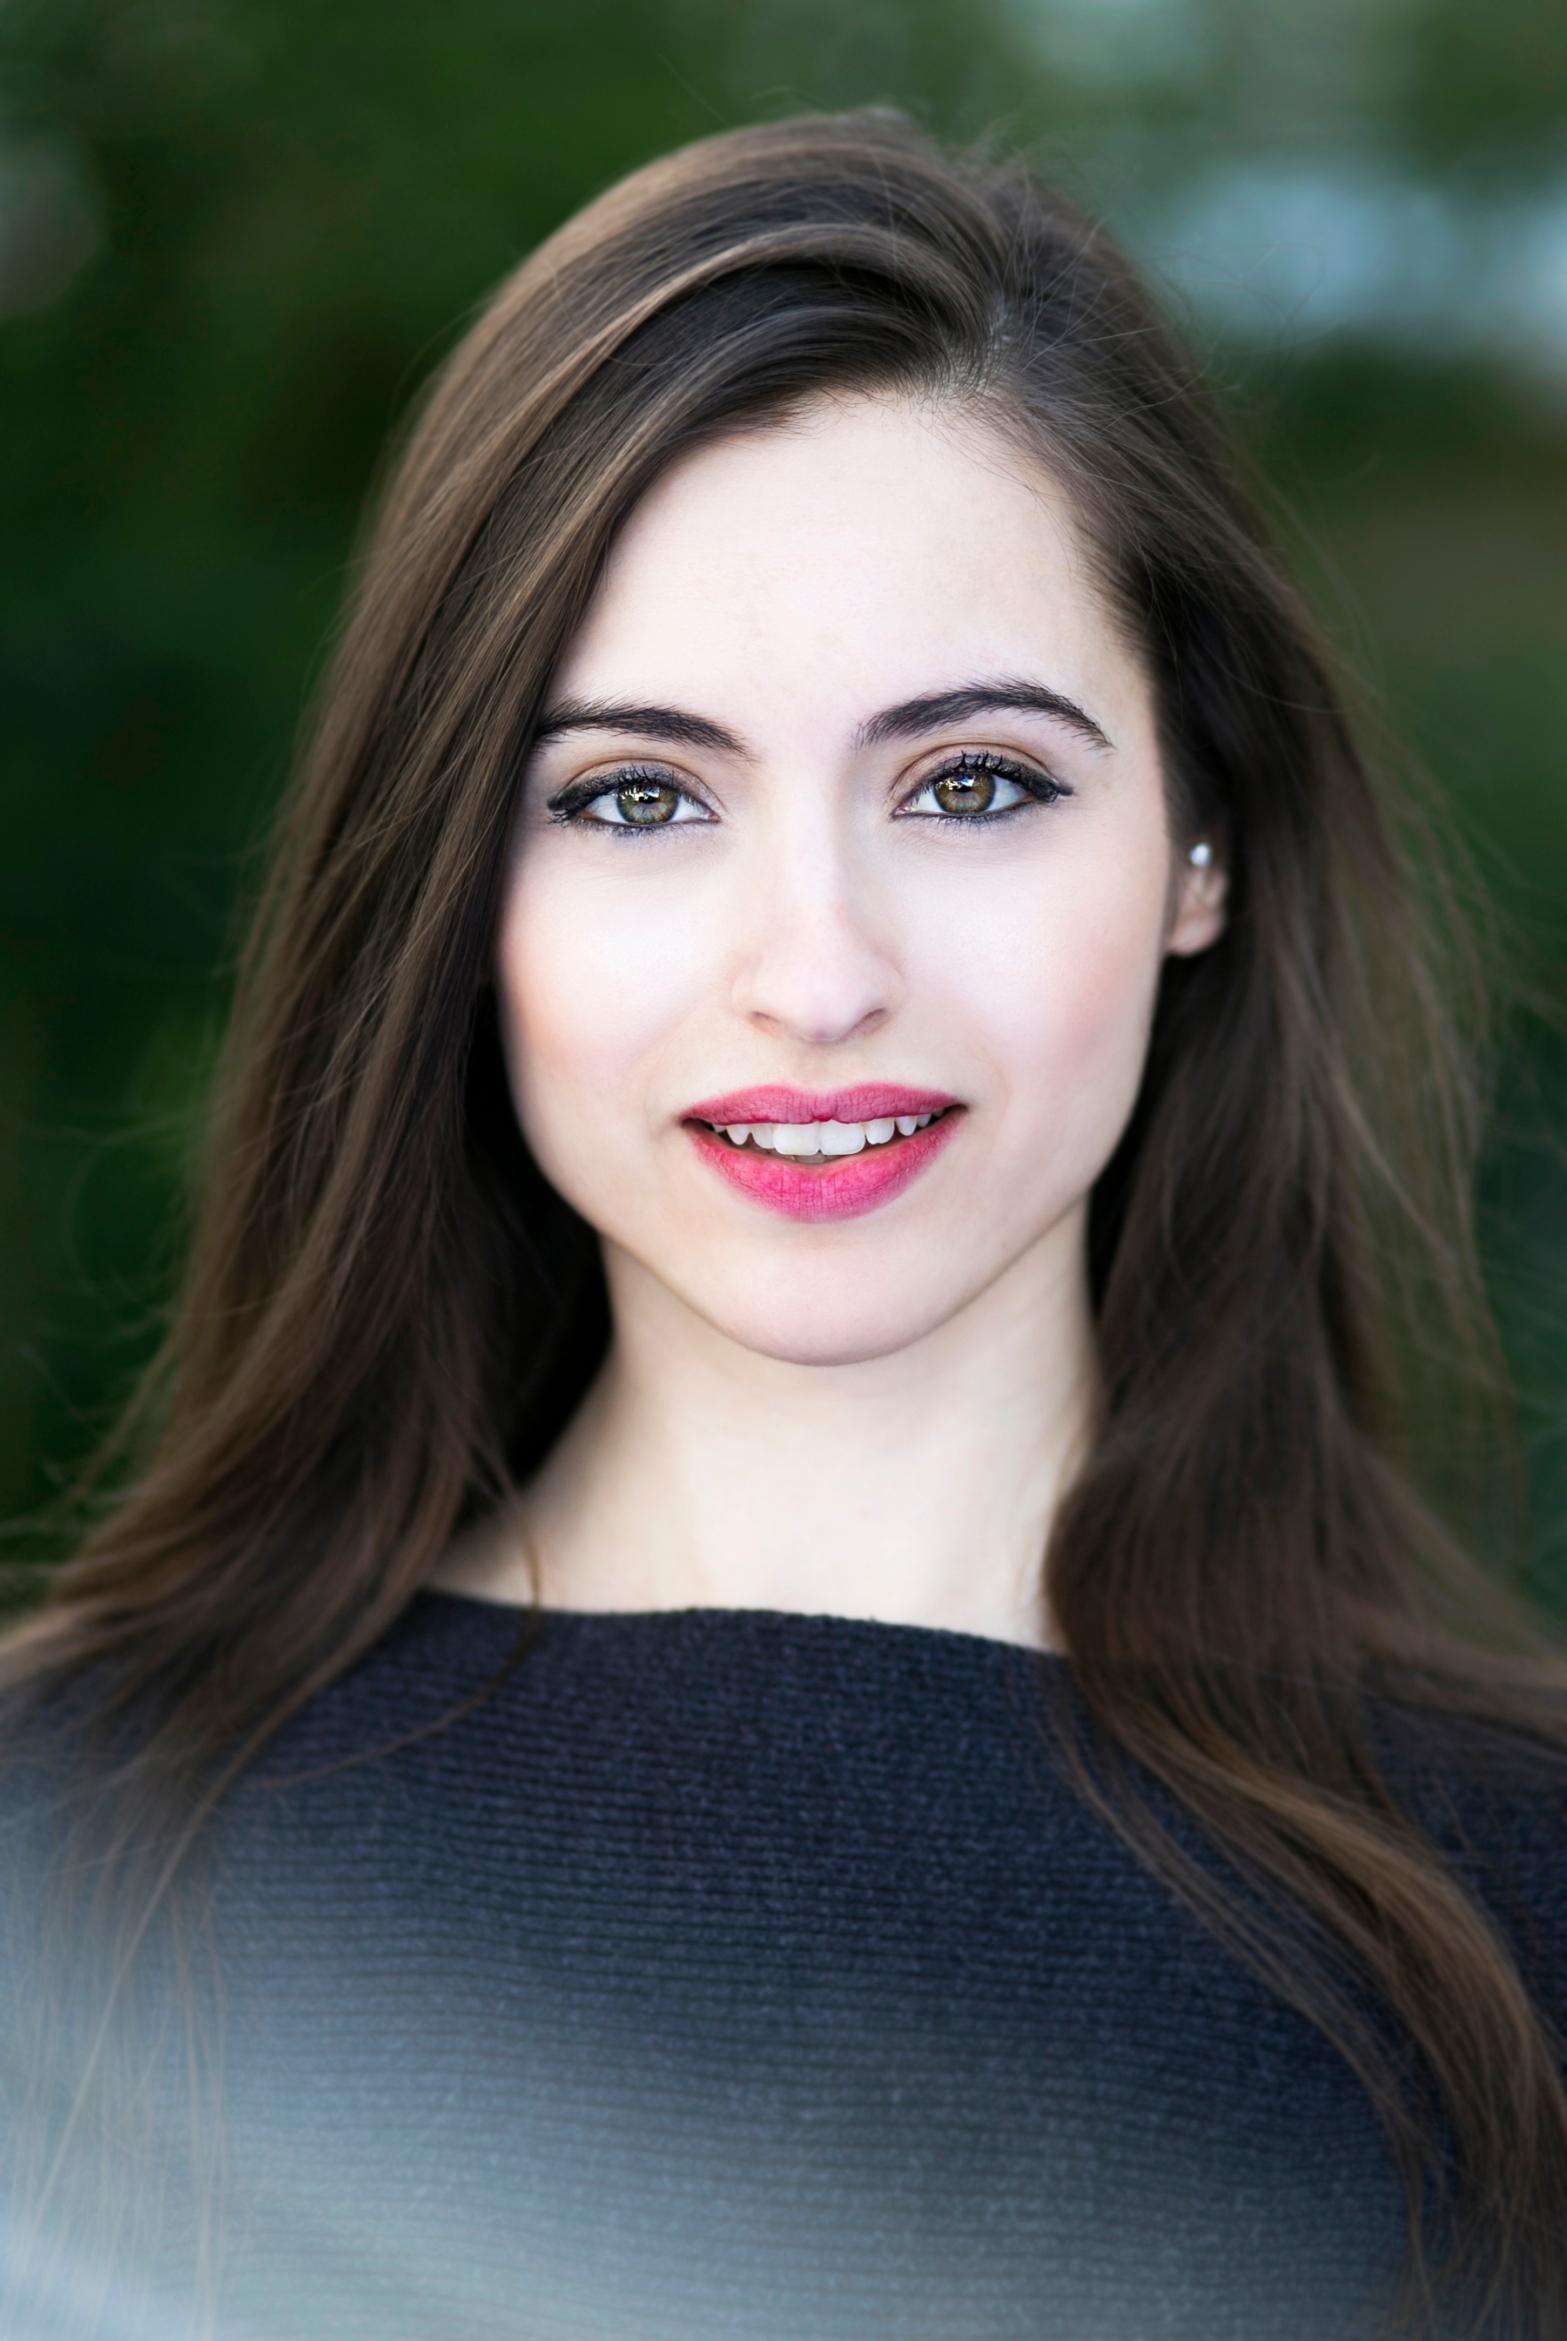 Director's biography: Victoria Malinjod